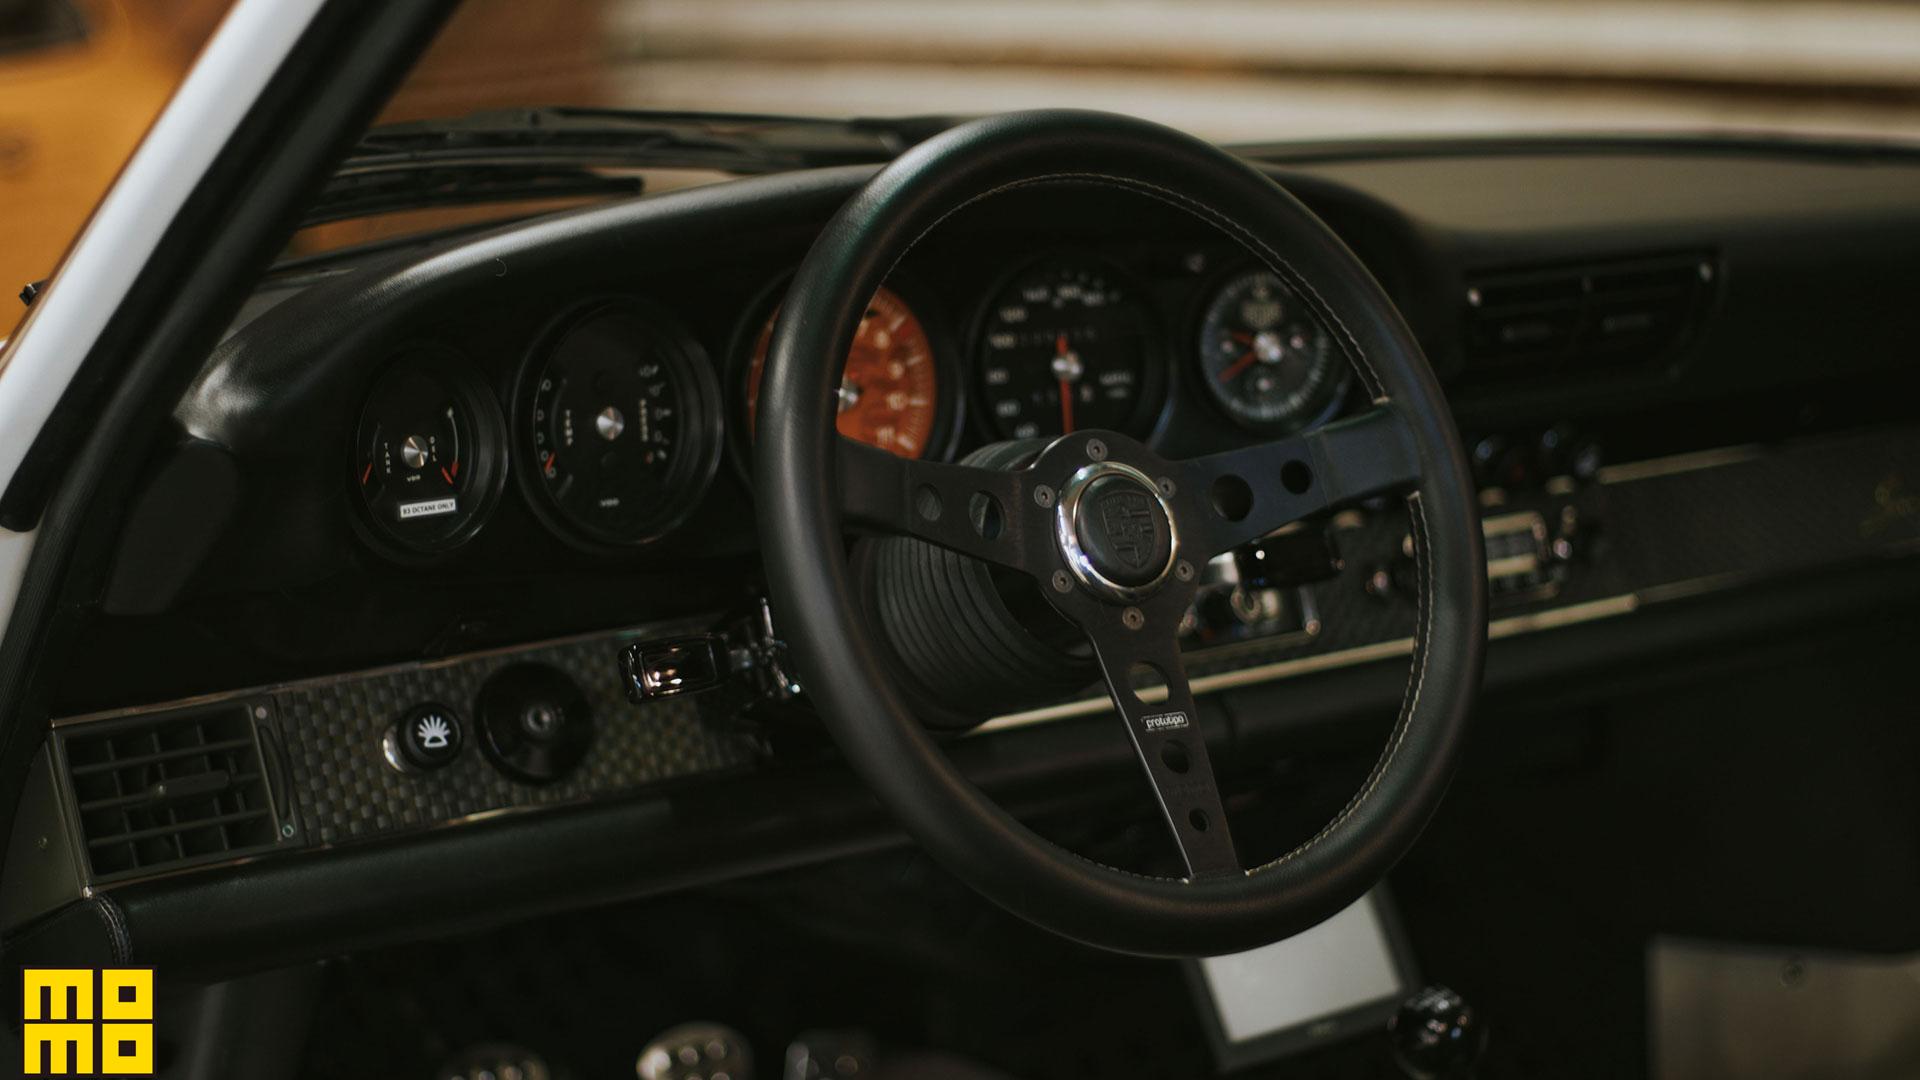 momo air cooled porsche 911 prototipo heritage steering. Black Bedroom Furniture Sets. Home Design Ideas